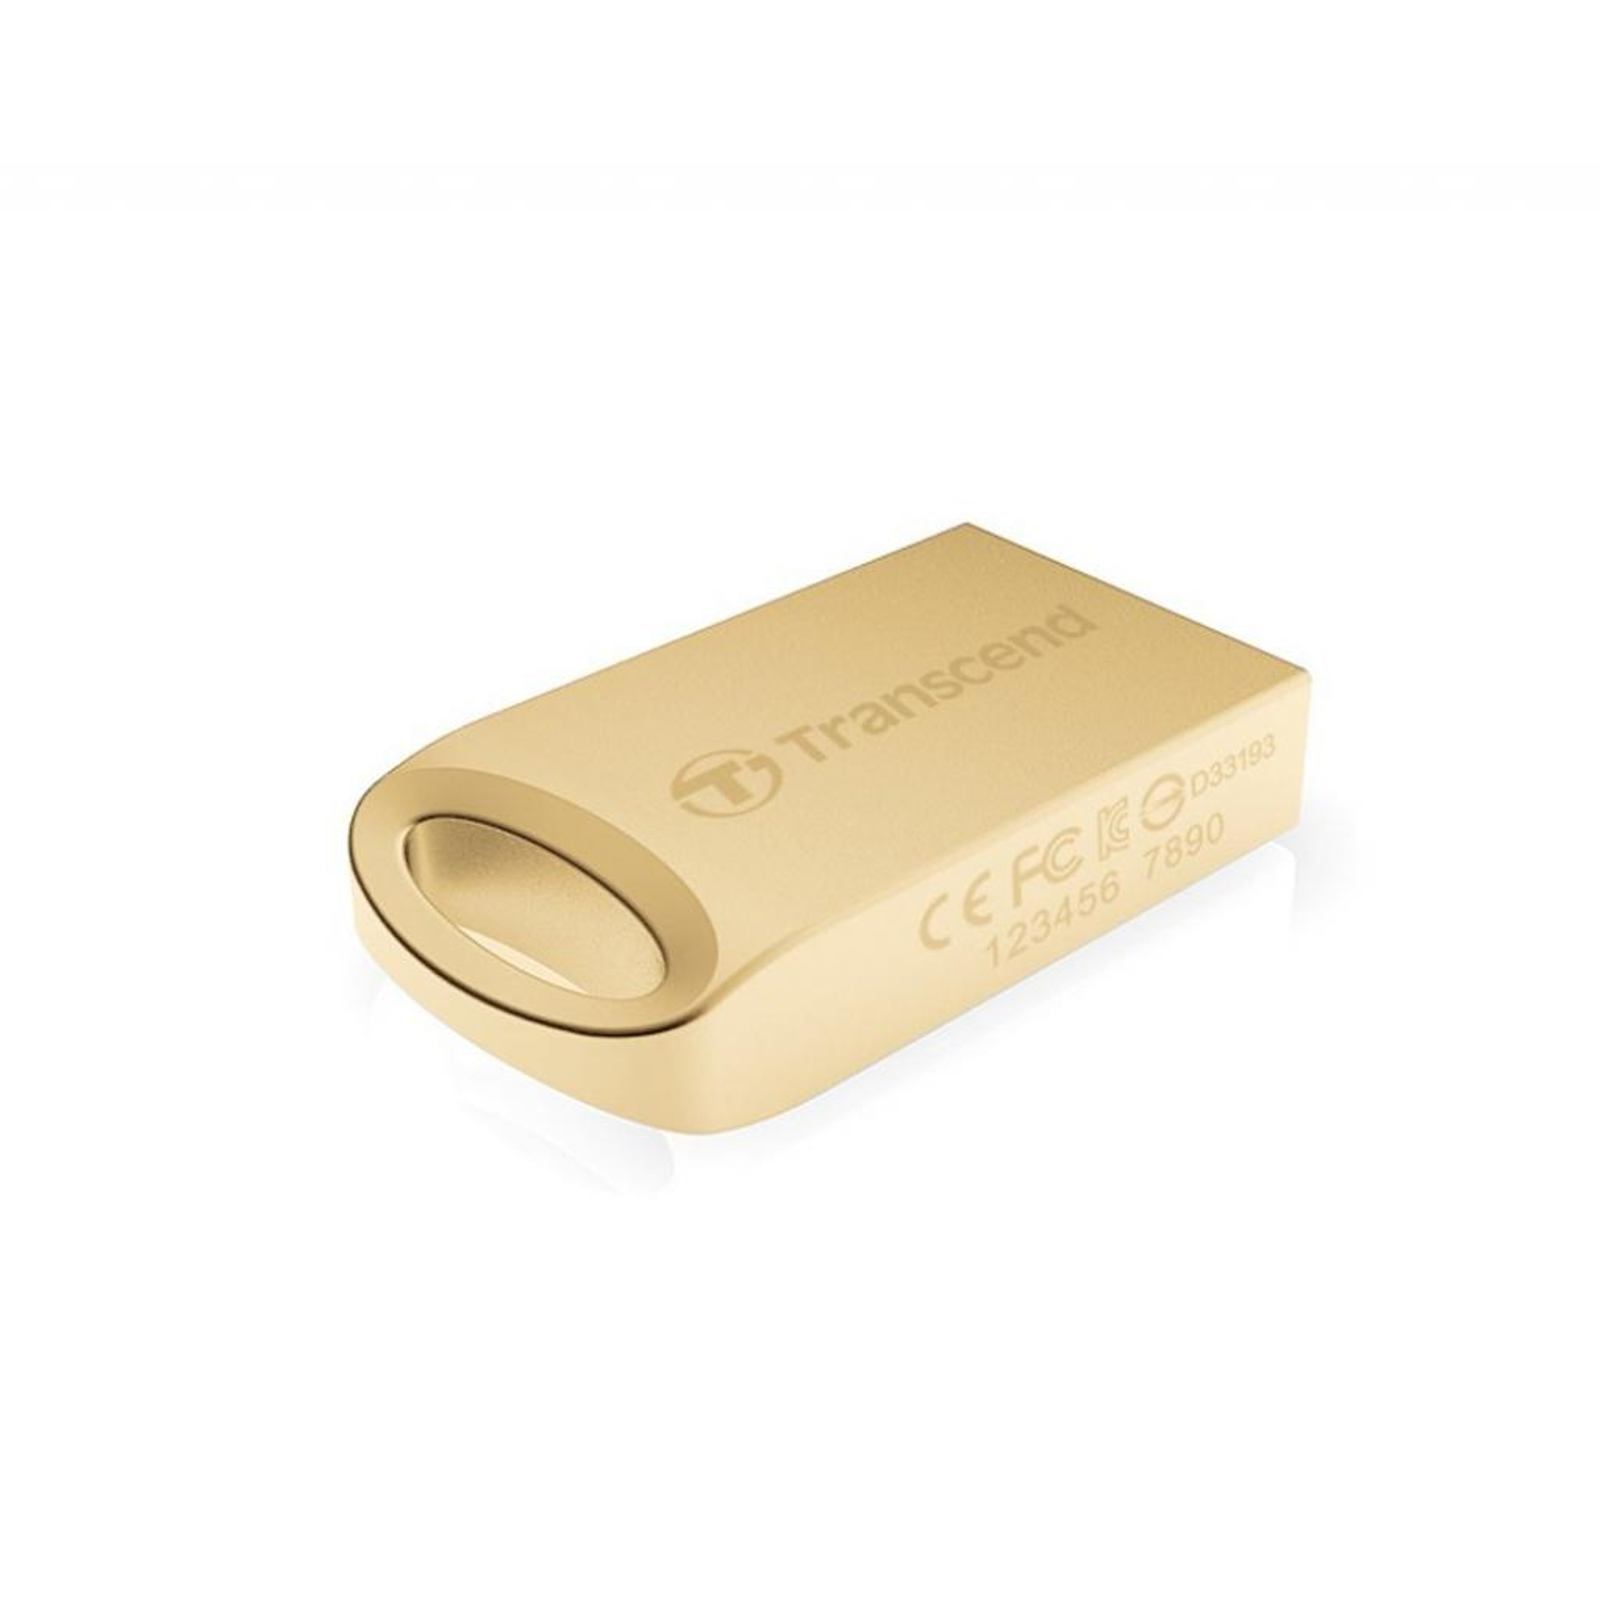 USB флеш накопитель Transcend JetFlash 510, Gold Plating (TS32GJF510G) изображение 3